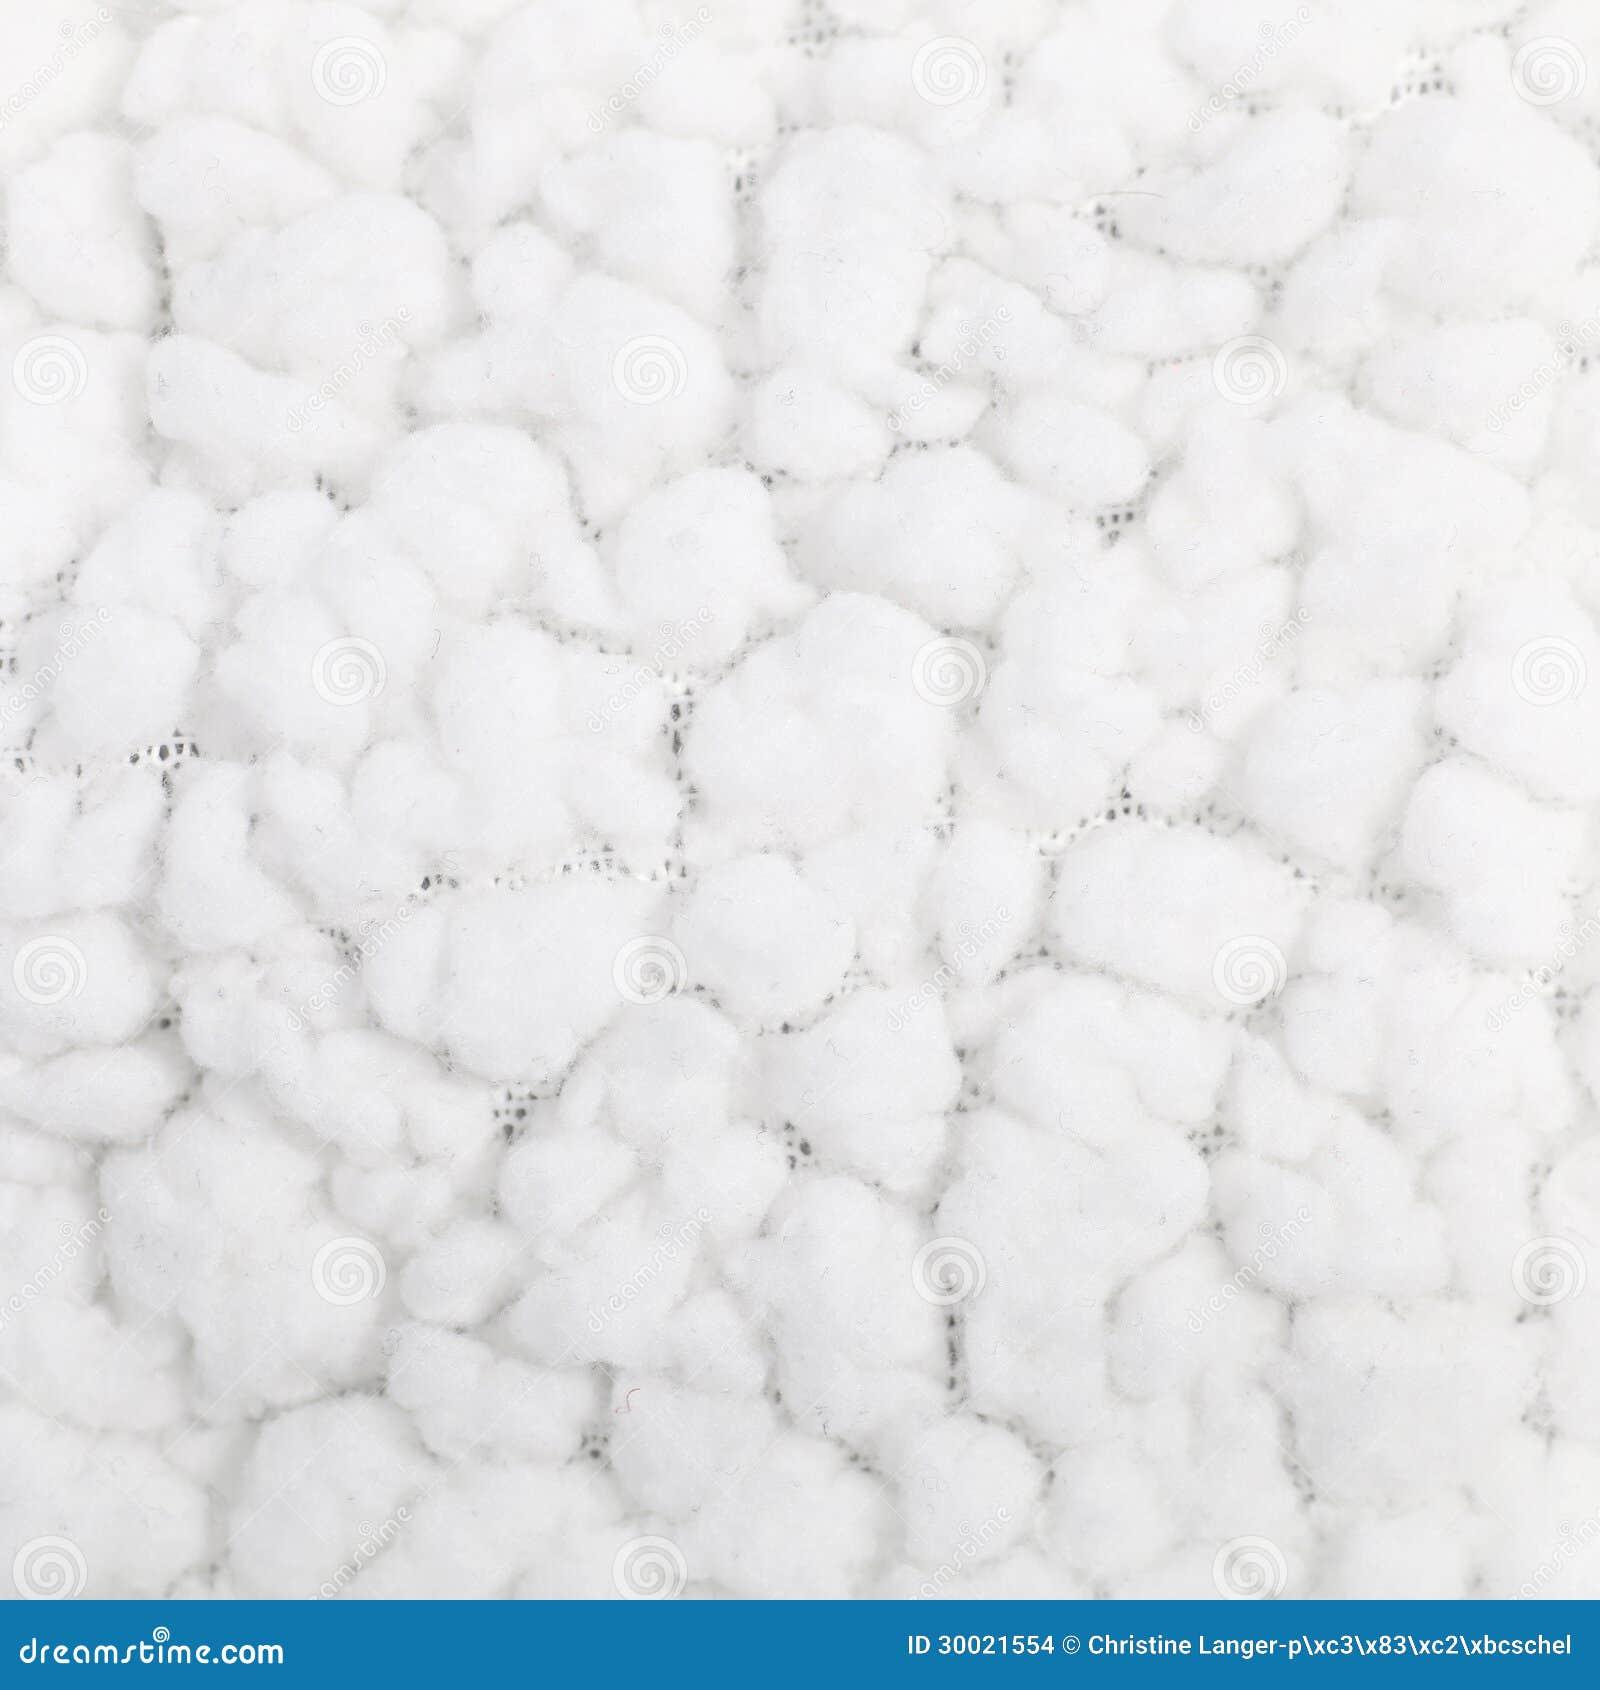 Materia Textil Blanca Mullida Suave Foto de archivo - Imagen de ...